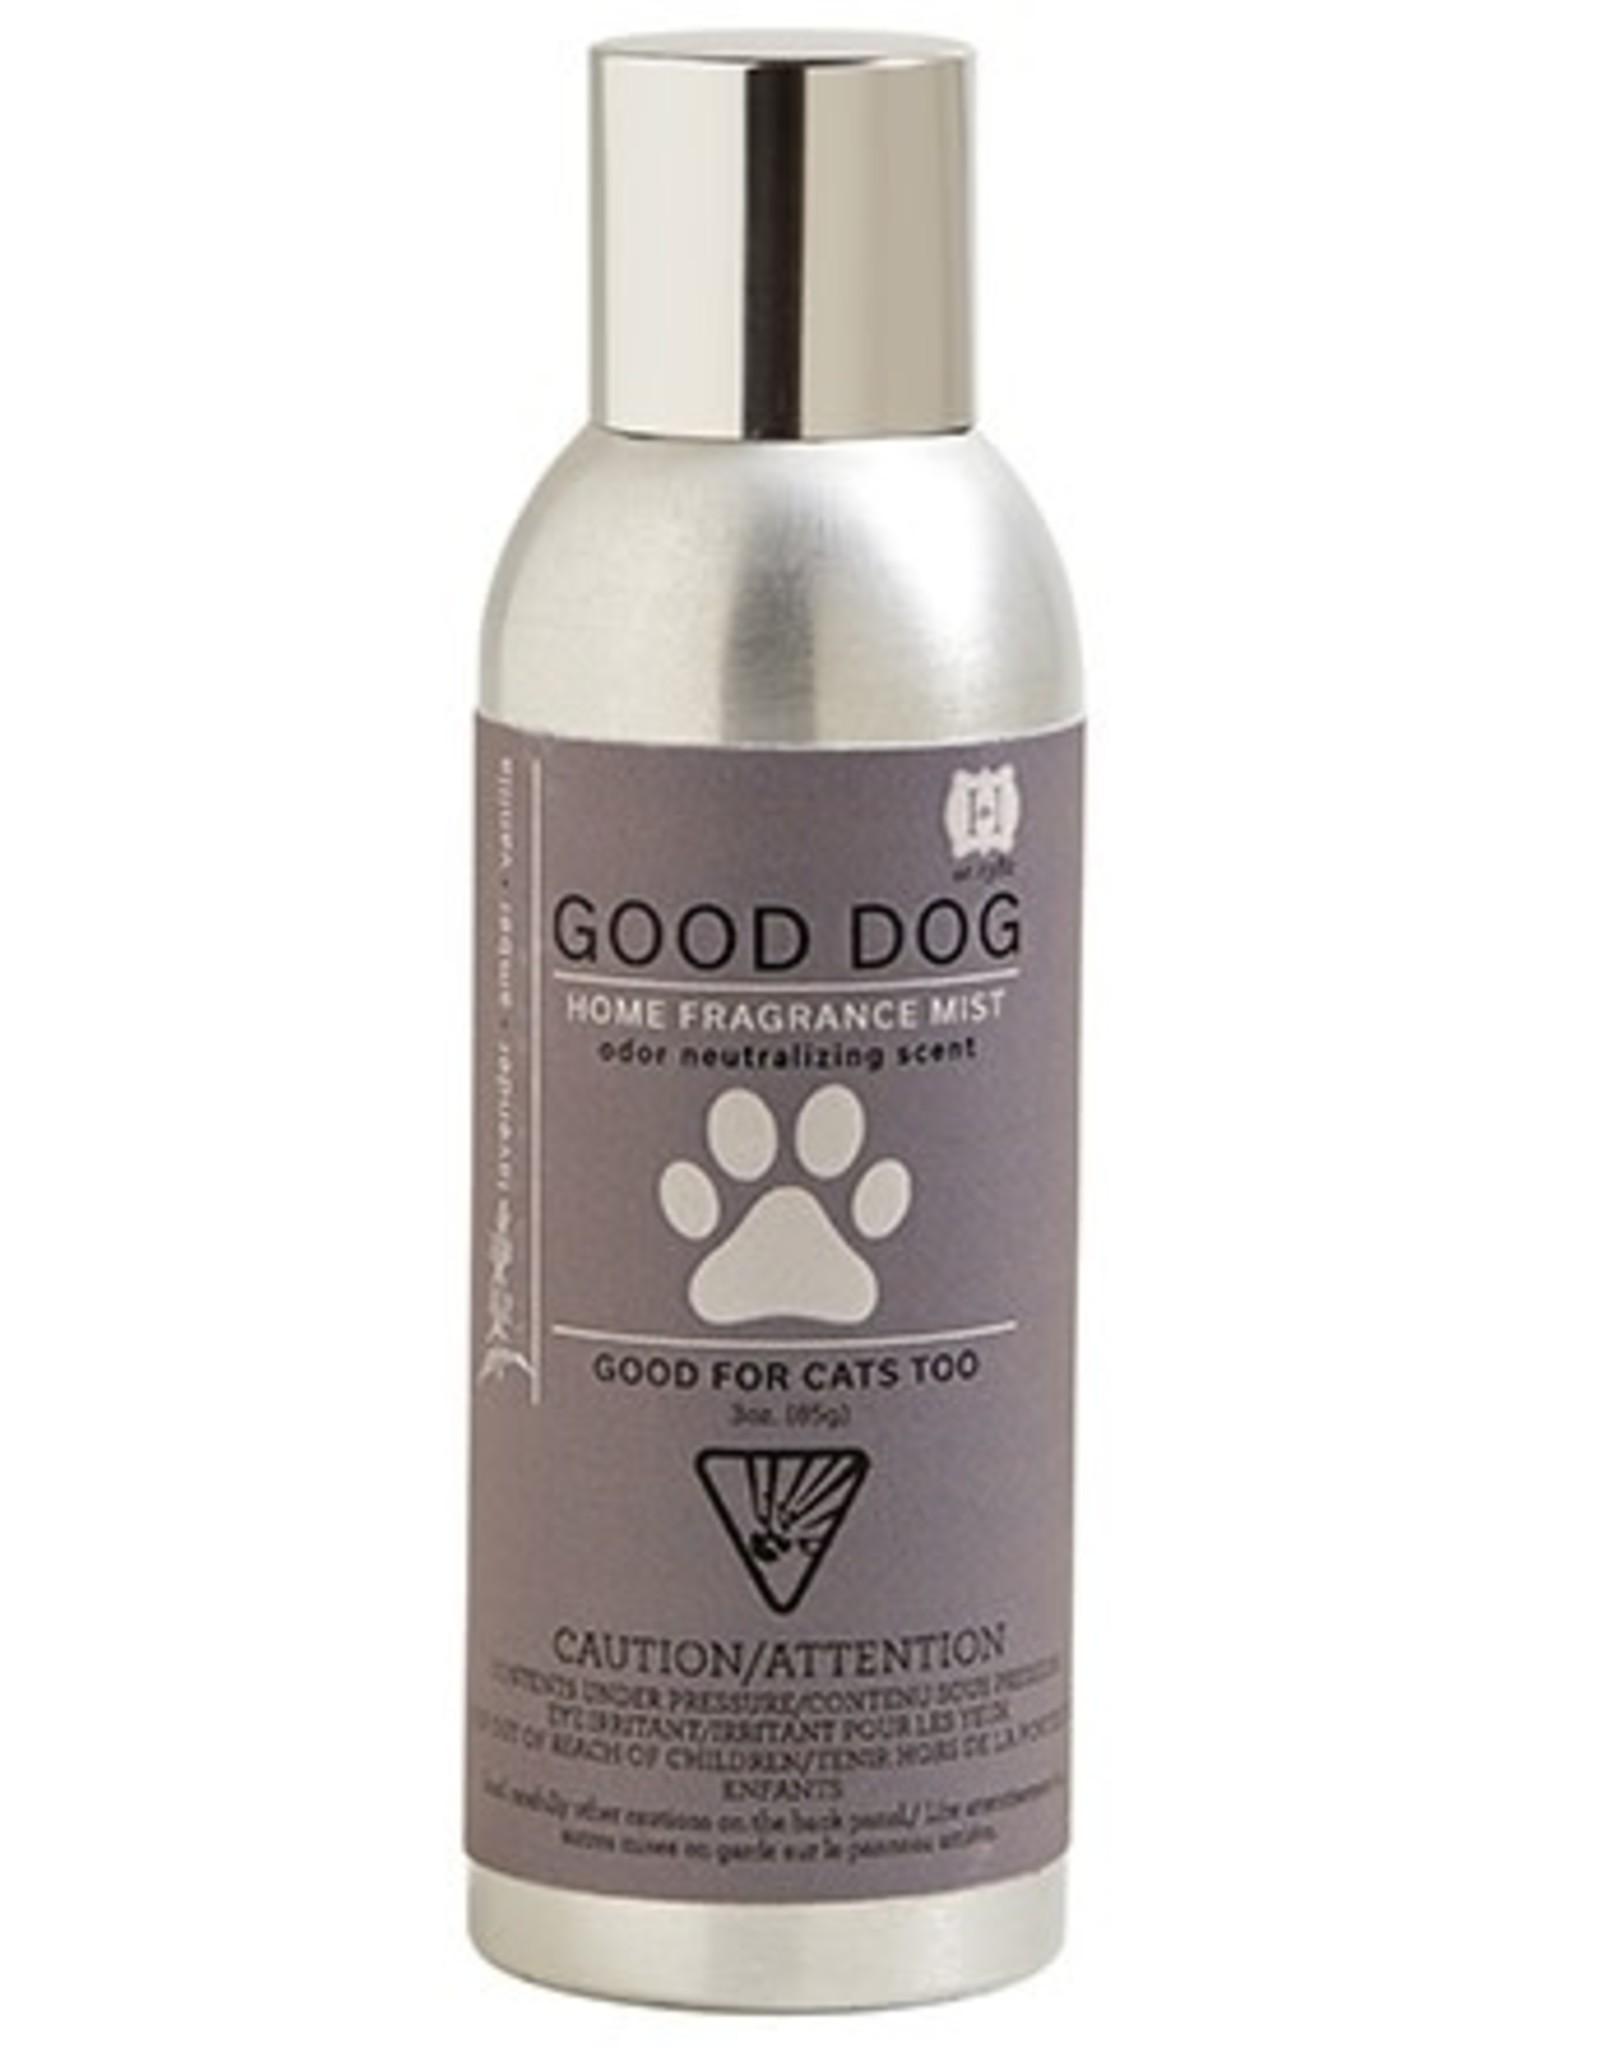 Hillhouse Naturals Good Dog Fragrance Mist